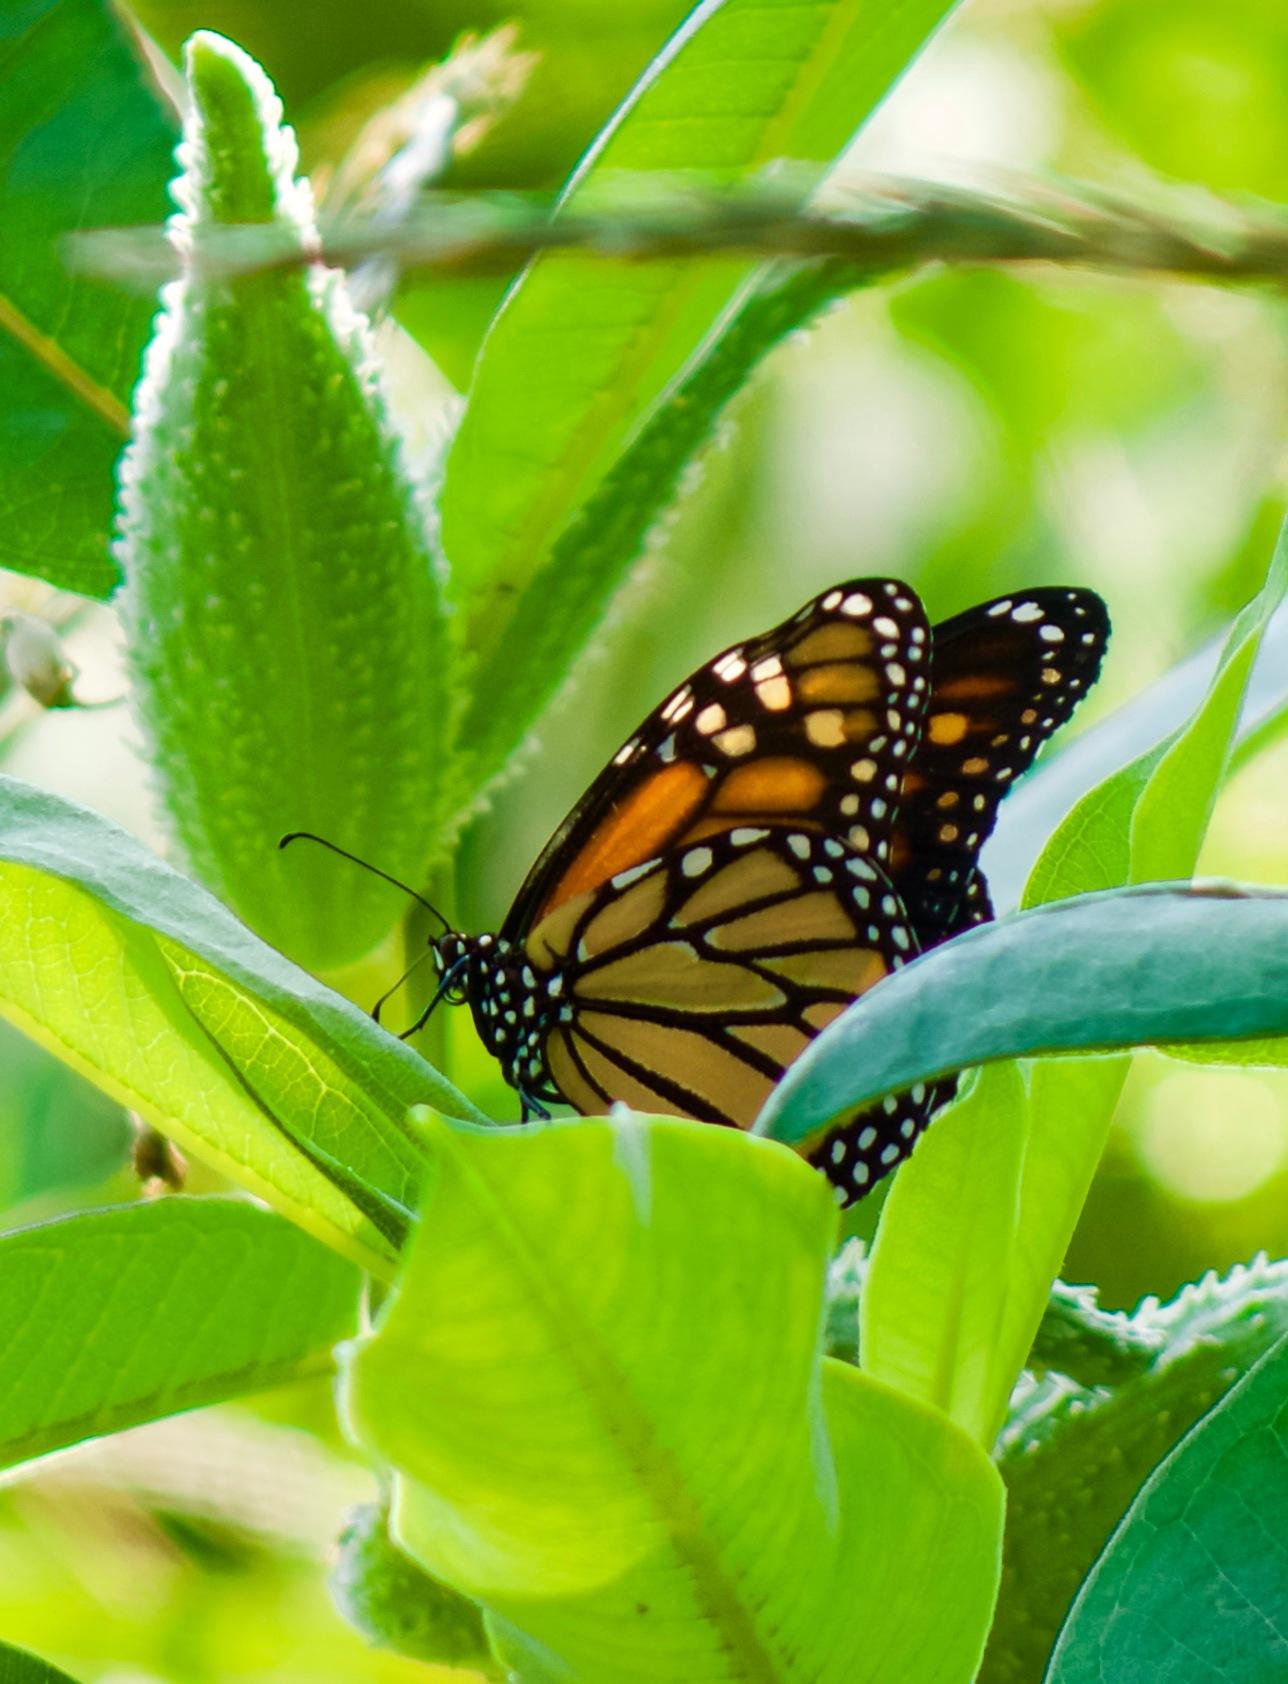 Monarch butterfly on milkweed pod by Karen Bekker